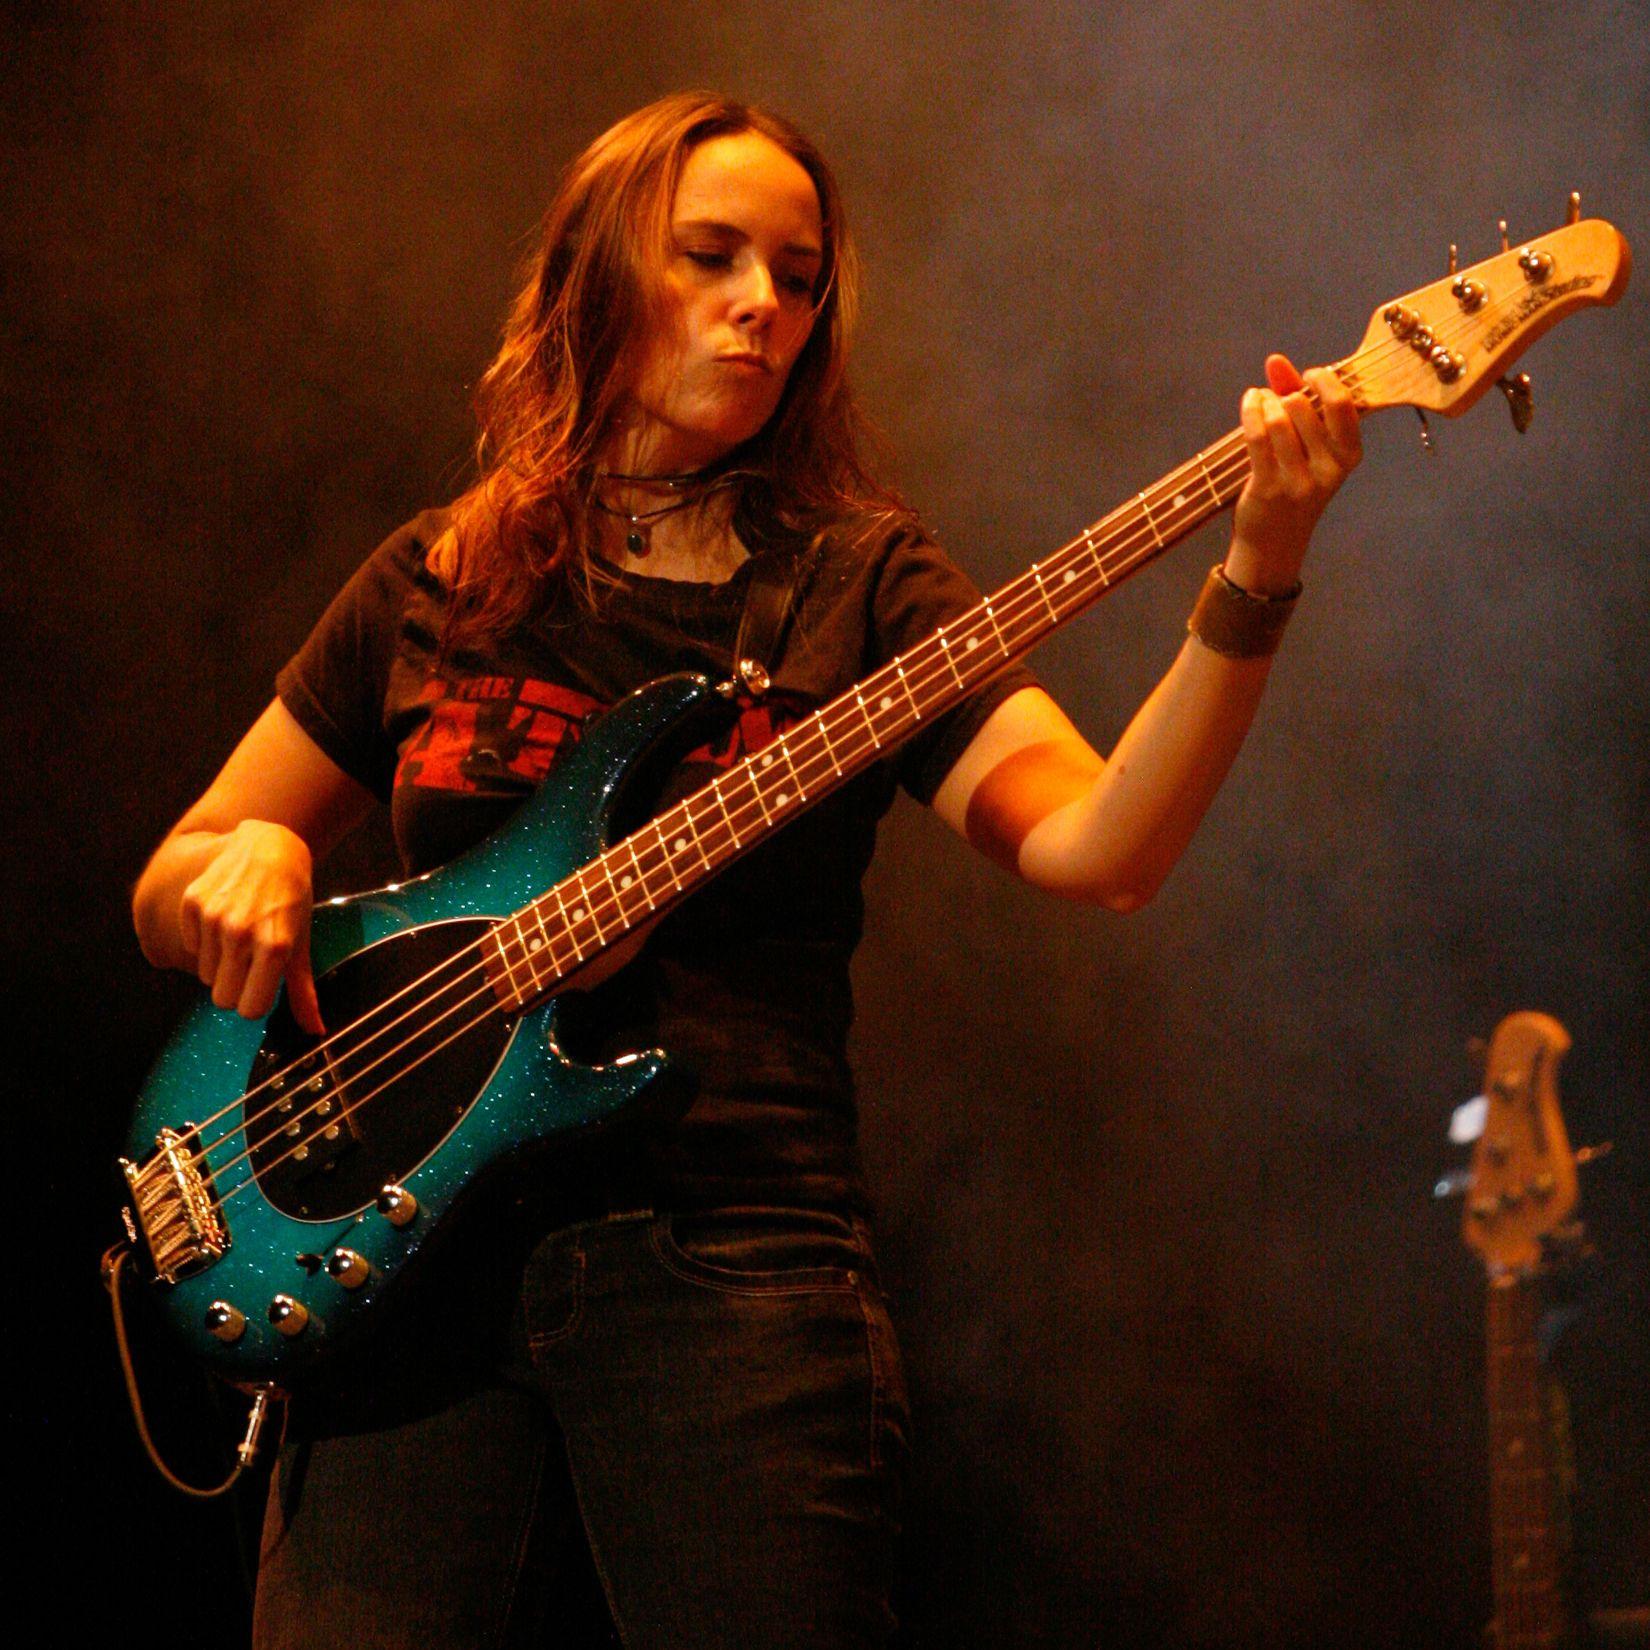 Jennifer young girls rock female artists guitar player